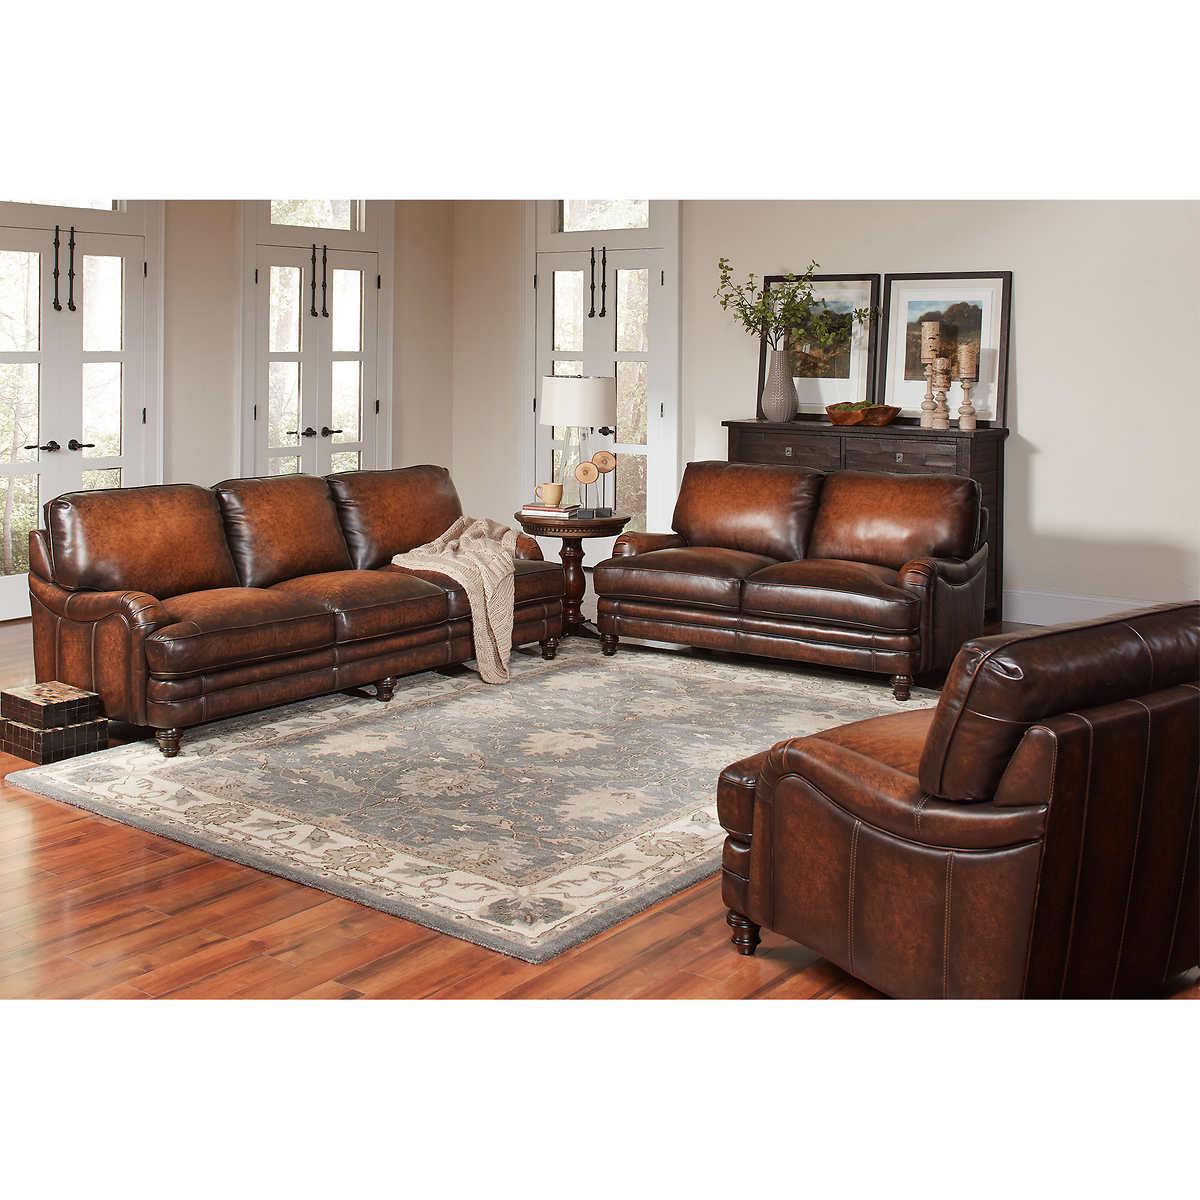 three piece living room set.  Langston 3 Piece Top Grain Leather Living Room Set